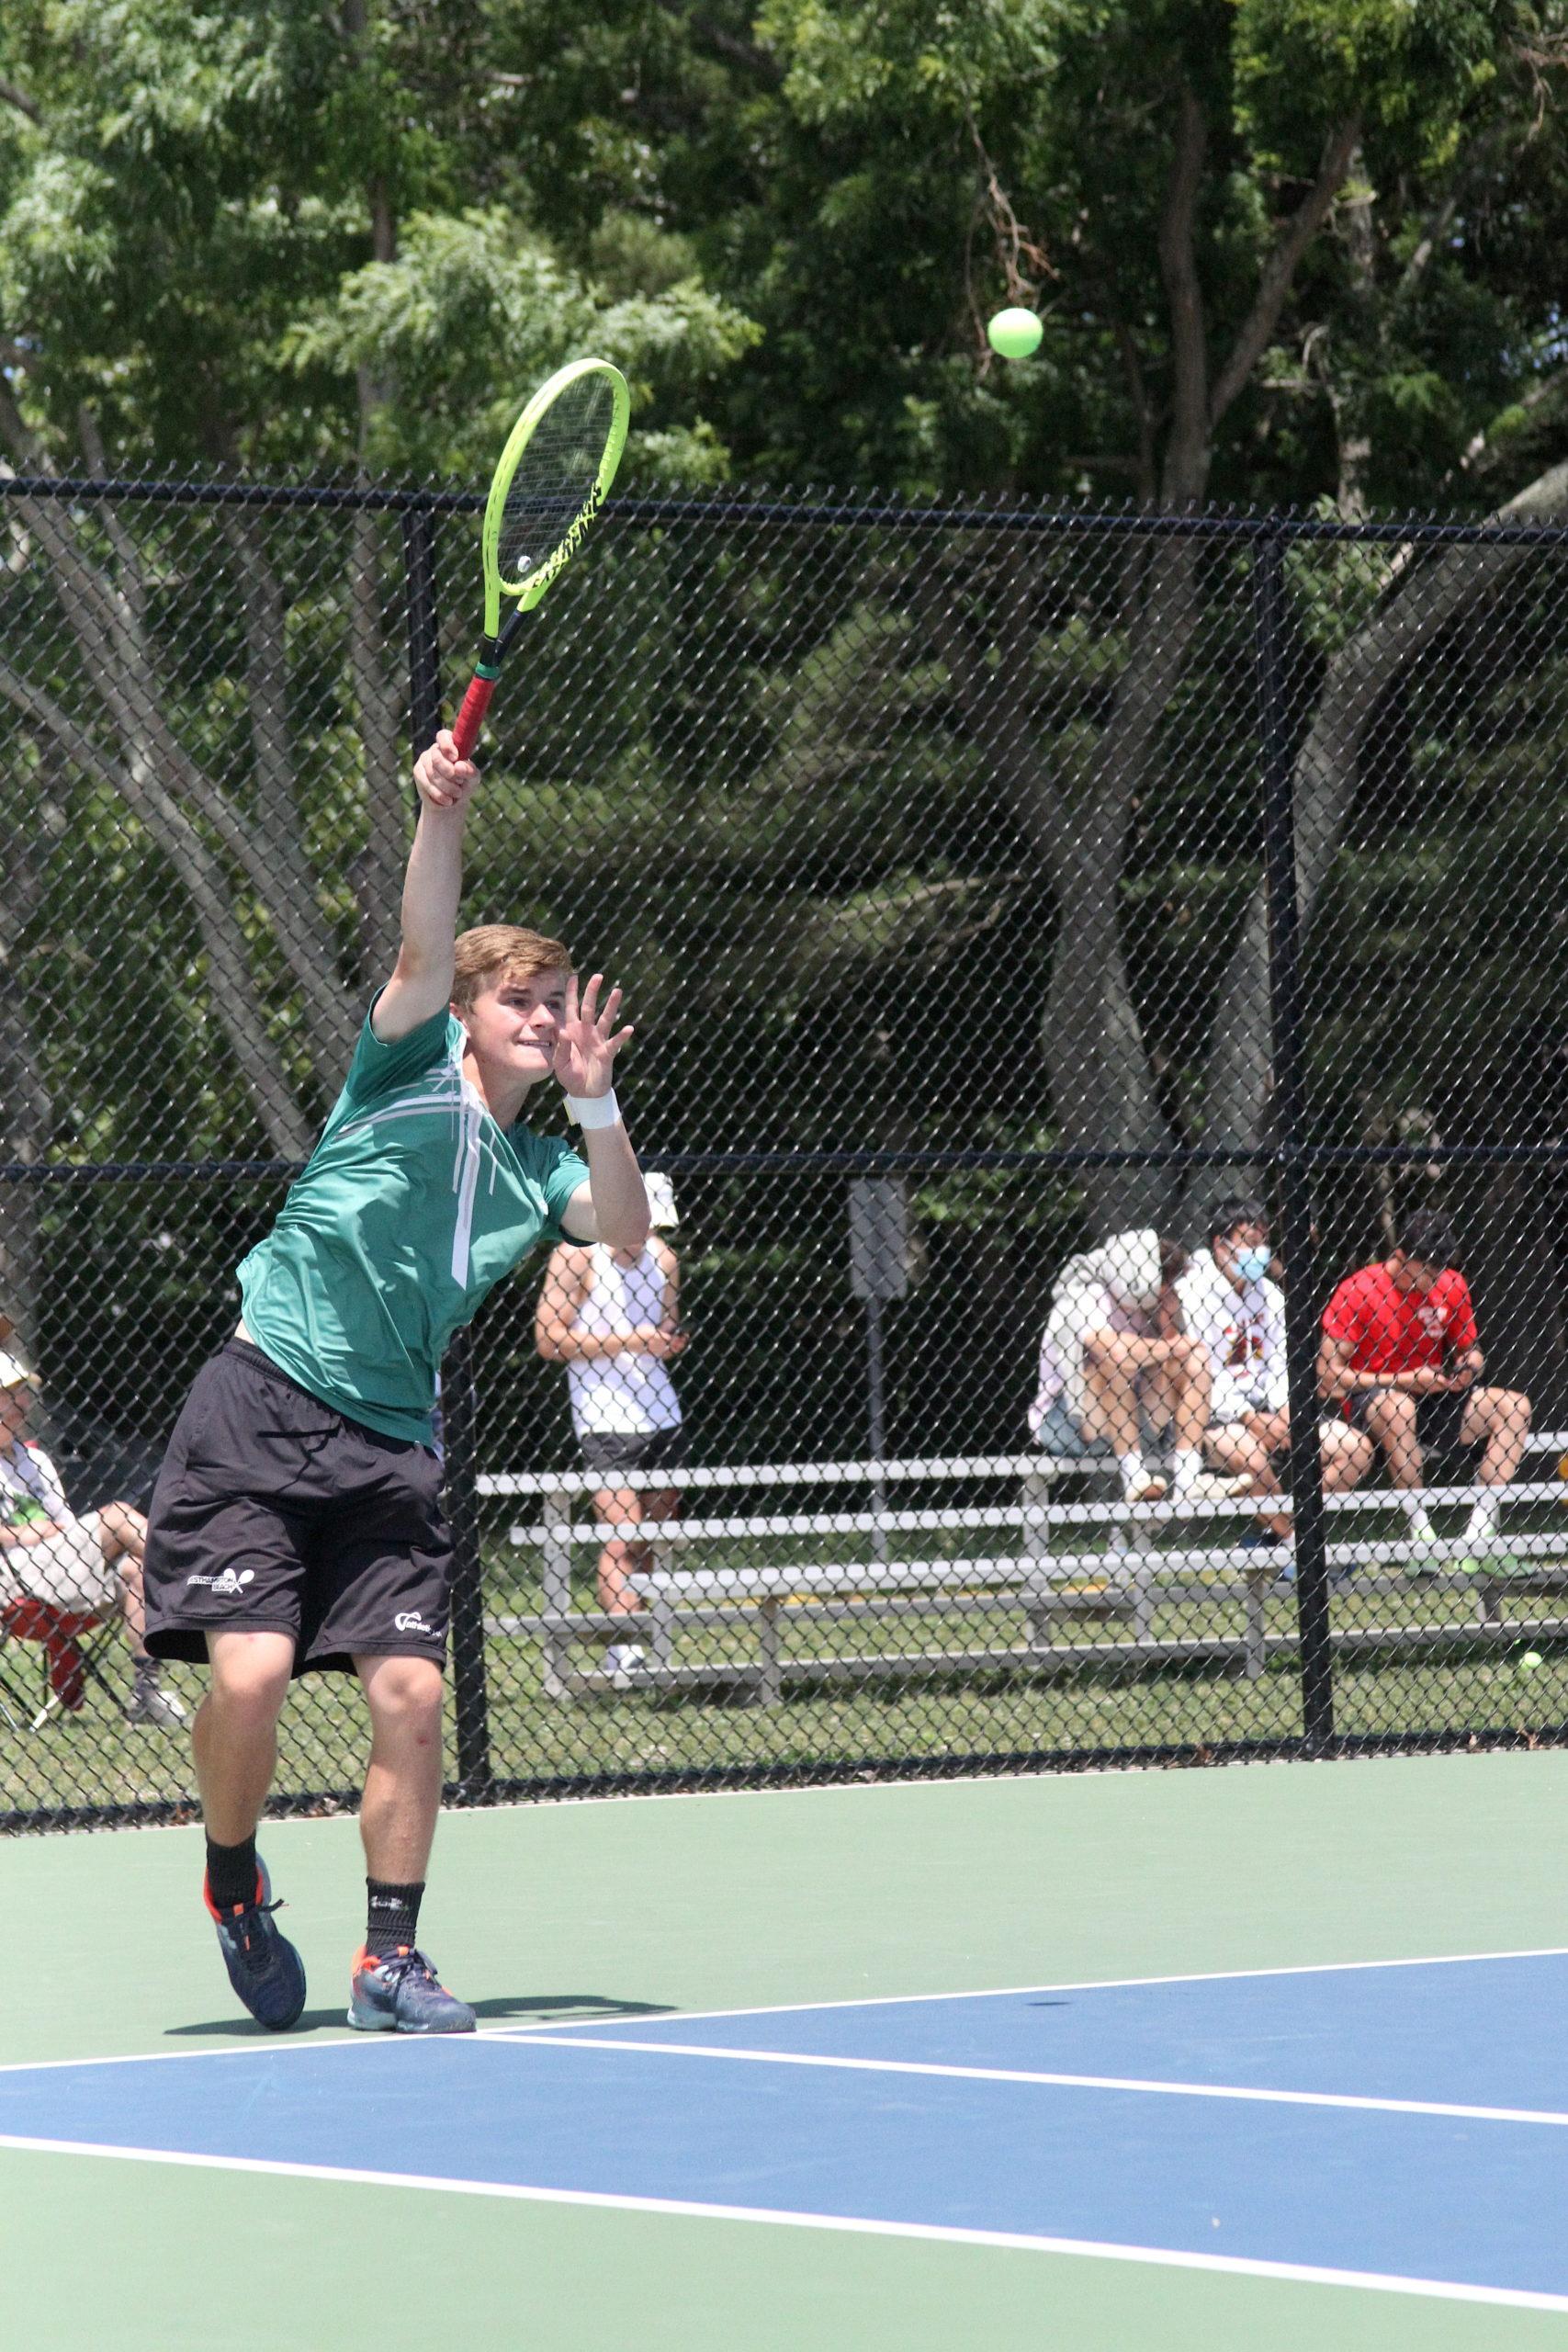 Westhampton Beach sophomore Bobby Stabile serves in his No. 3-seeded doubles team's DESIRÉE KEEGAN